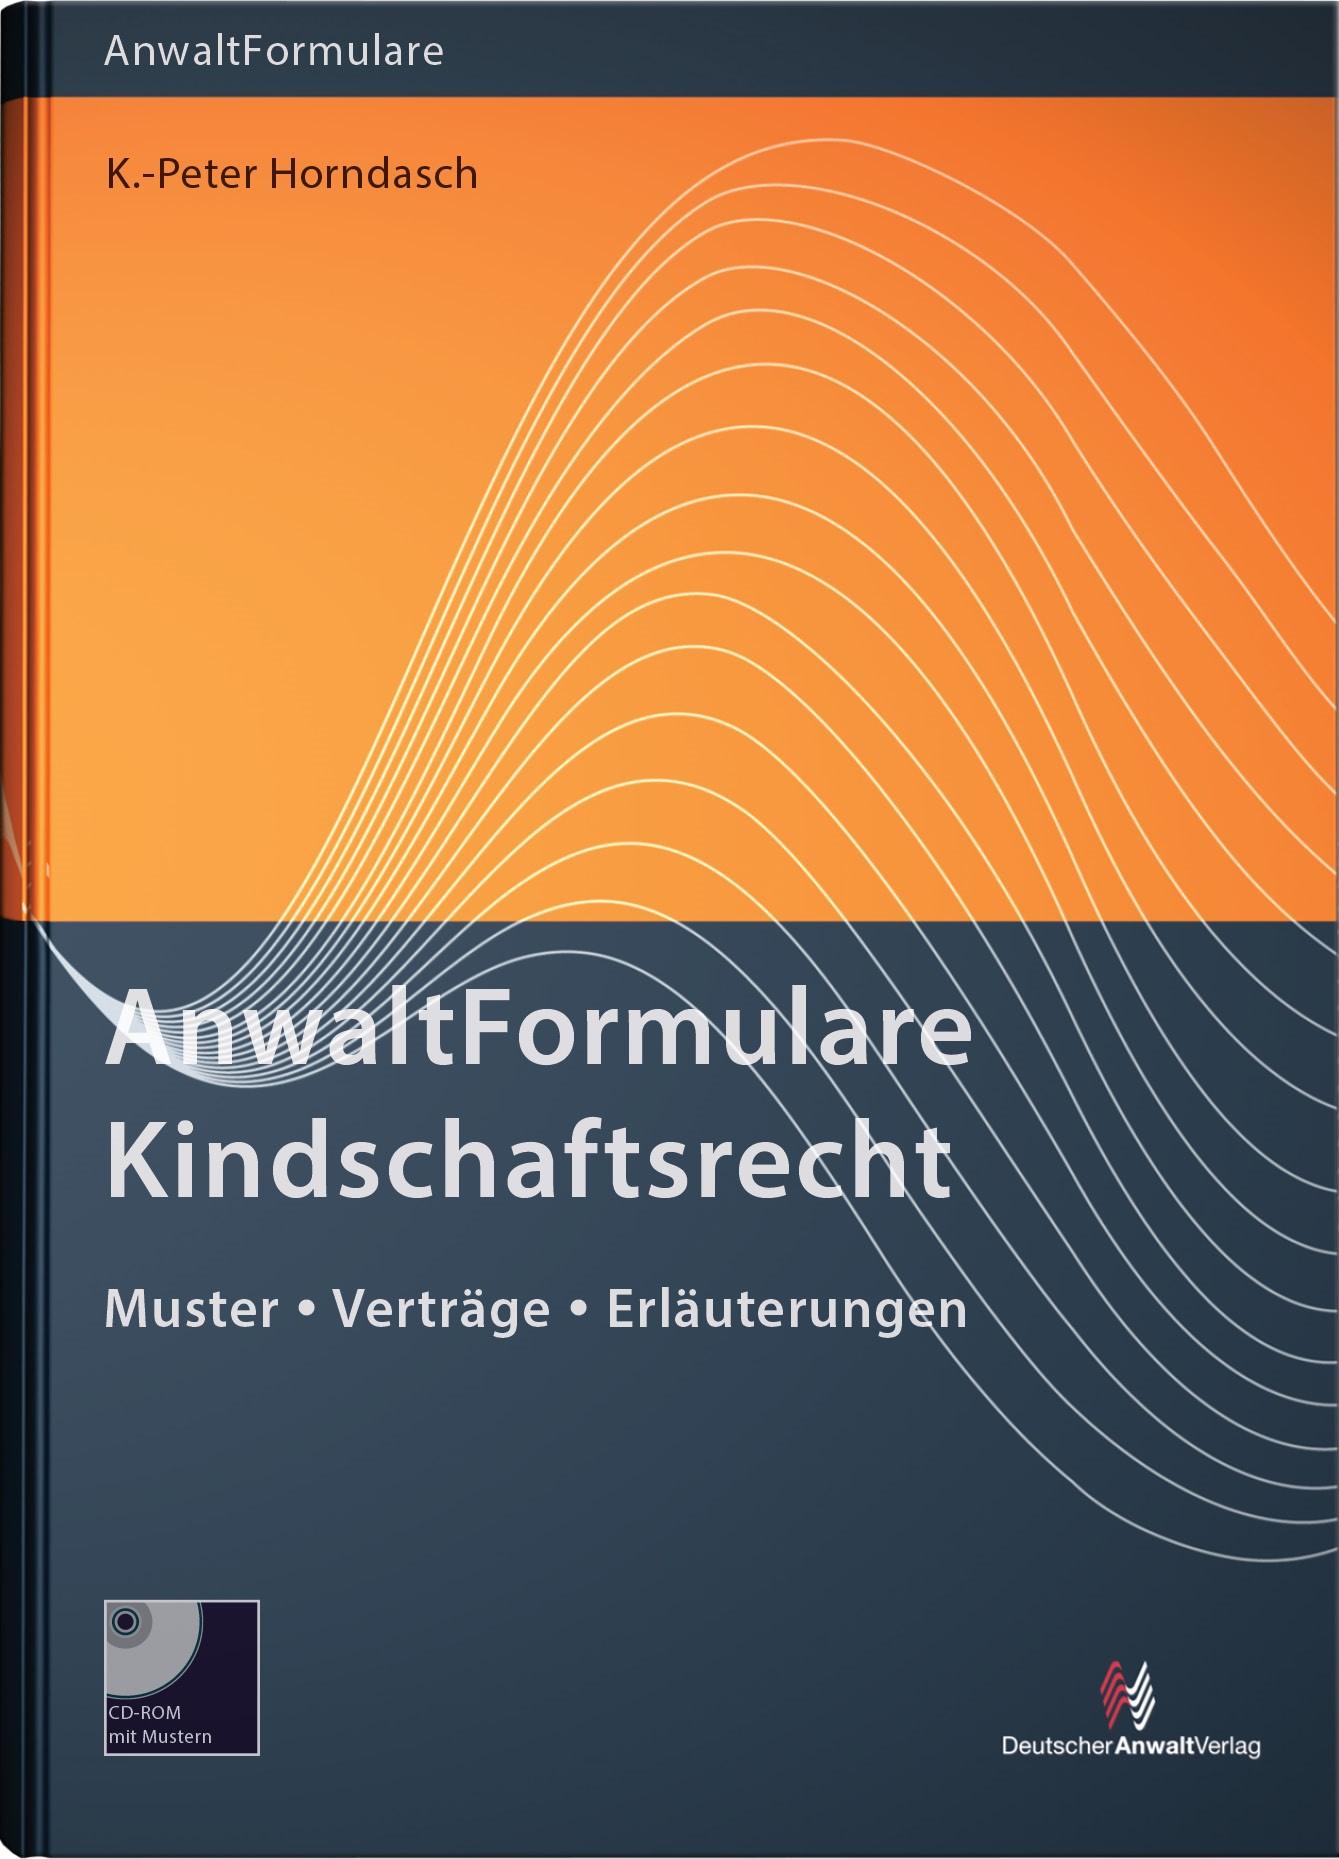 AnwaltFormulare Kindschaftsrecht | Horndasch, 2016 | Buch (Cover)